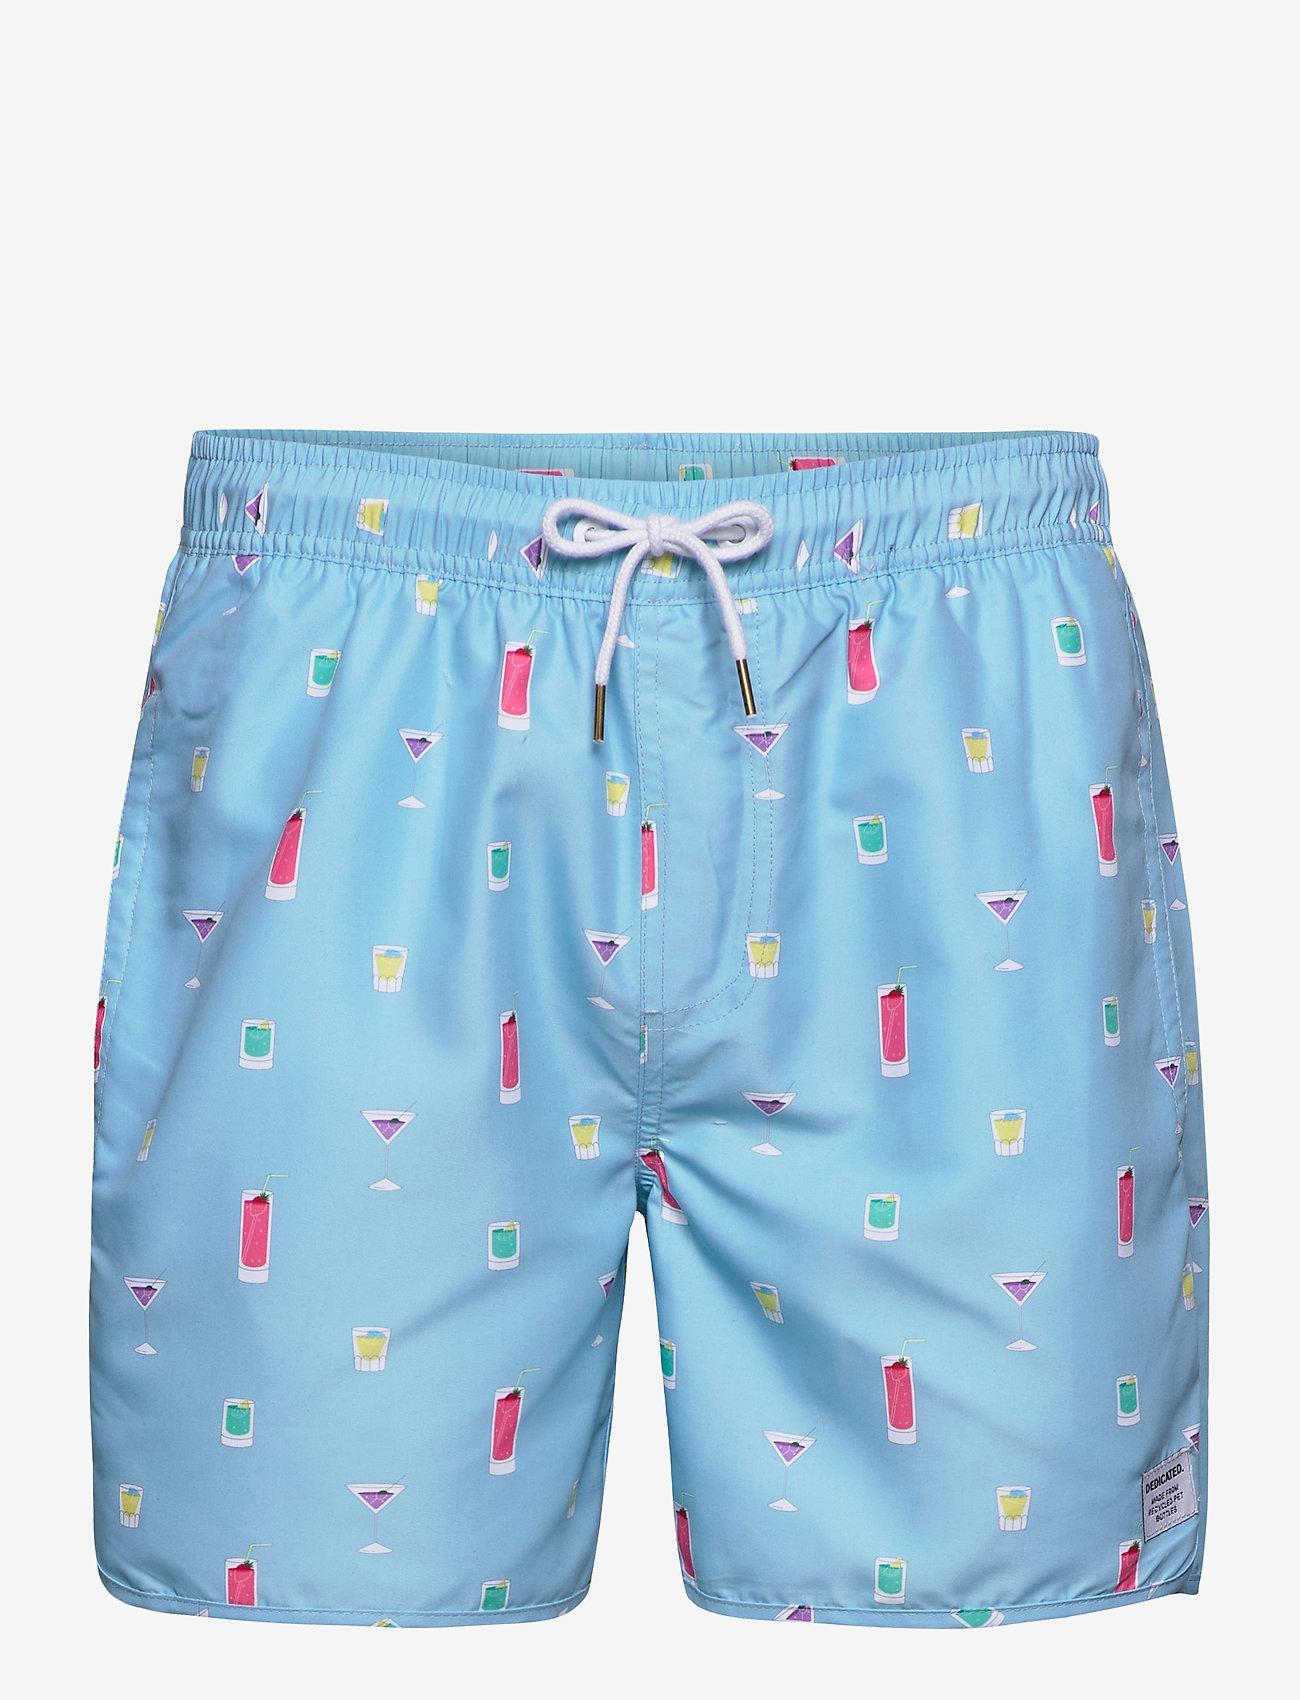 DEDICATED - Swim Shorts Drinks - shorts de bain - turqouise - 0